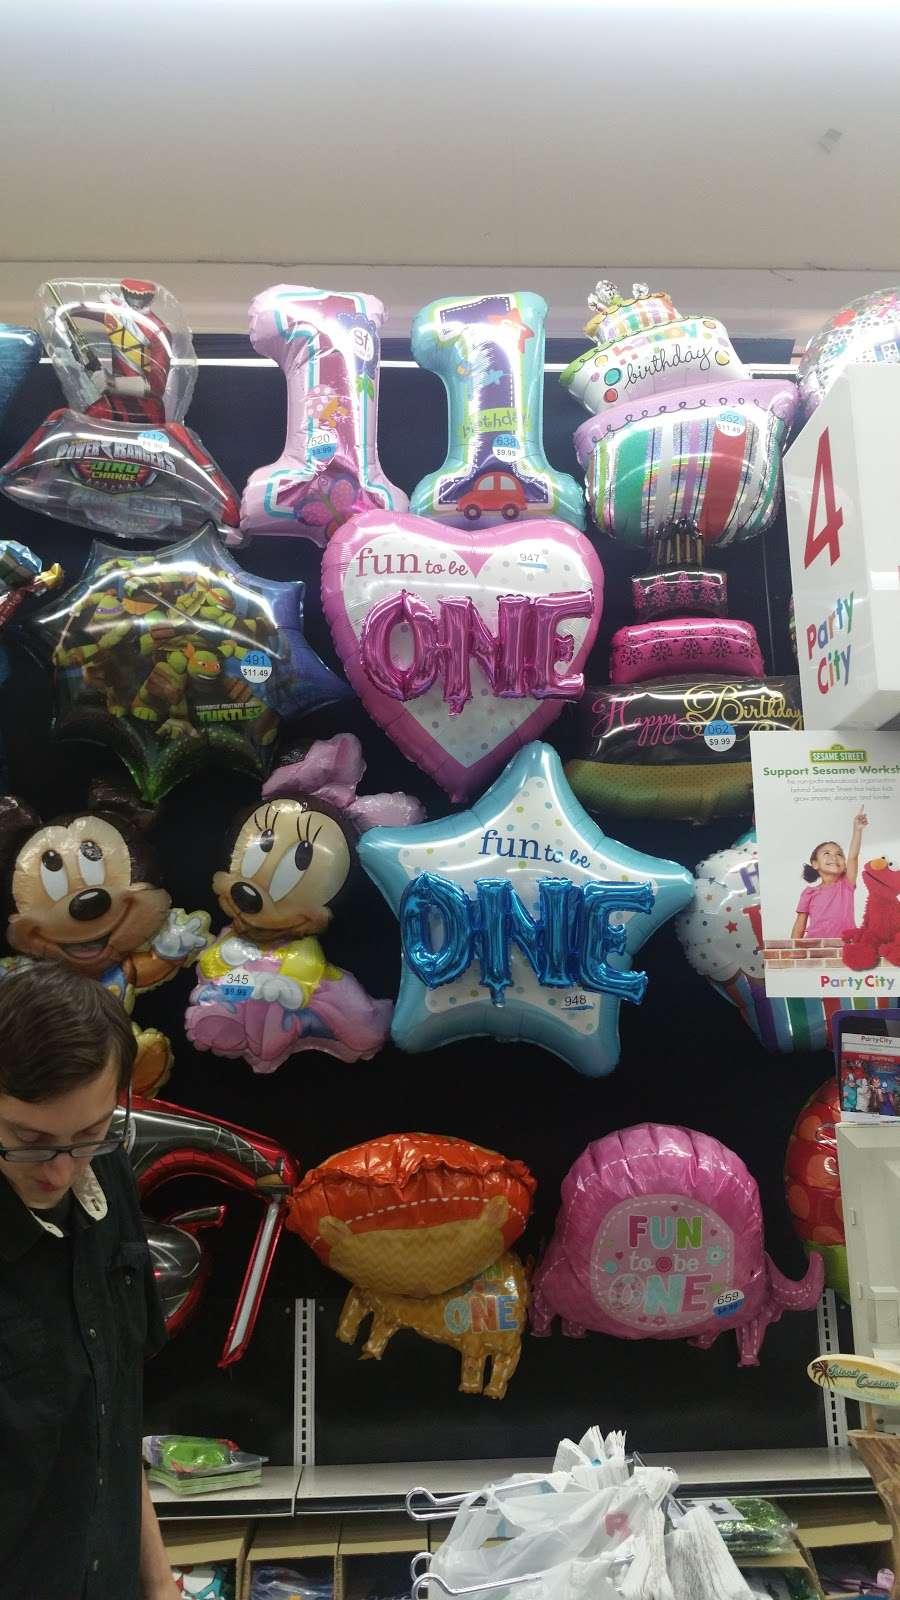 Party City - home goods store  | Photo 6 of 10 | Address: 821 N Dobson Rd, Mesa, AZ 85201, USA | Phone: (480) 668-9000